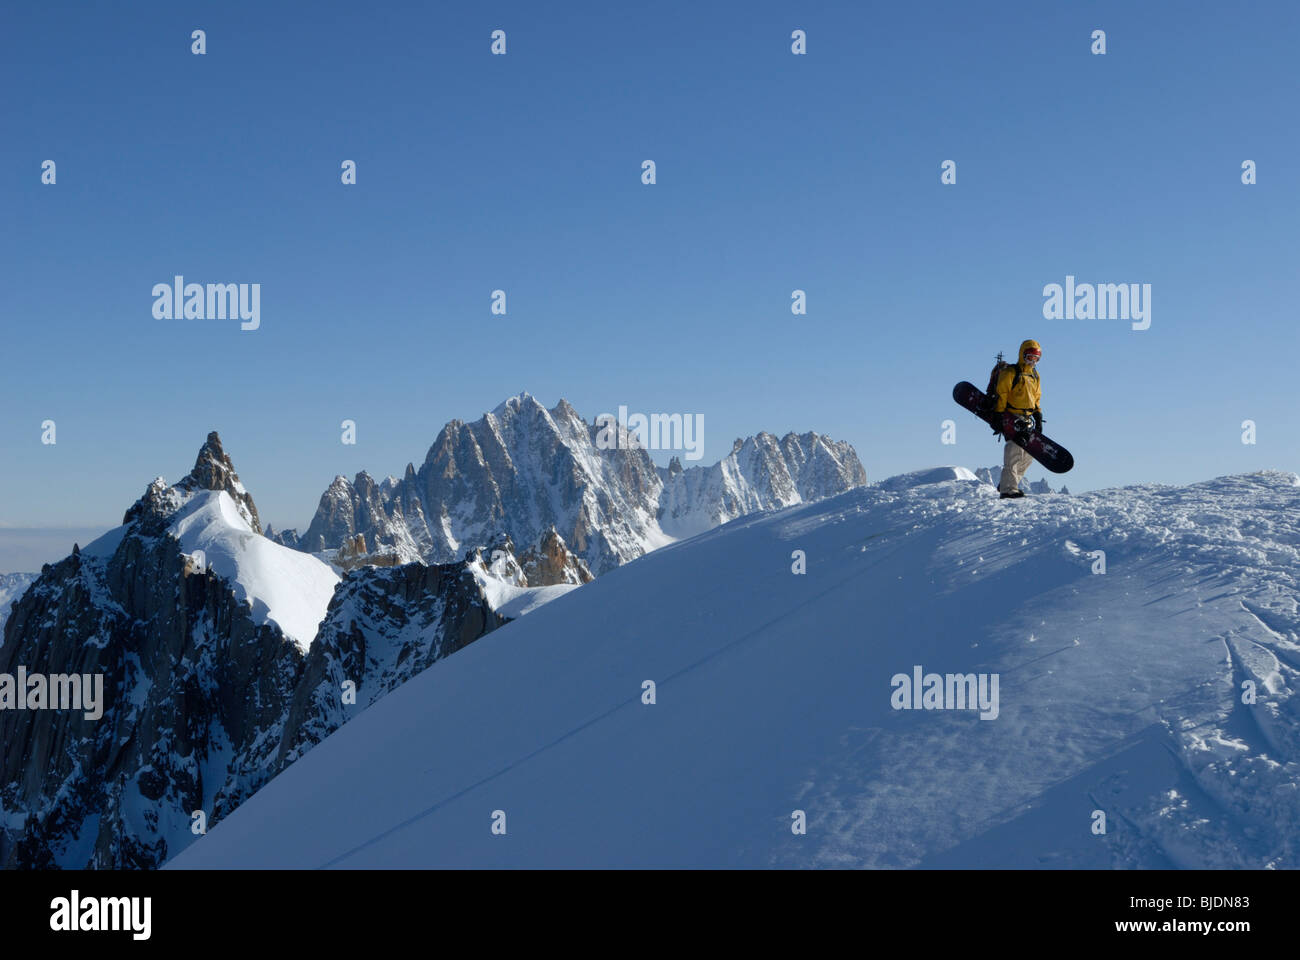 Snowboarder walking on lofty mountain ridge above Vallee Blanche on Aiguille du Midi, Chamonix, France - Stock Image